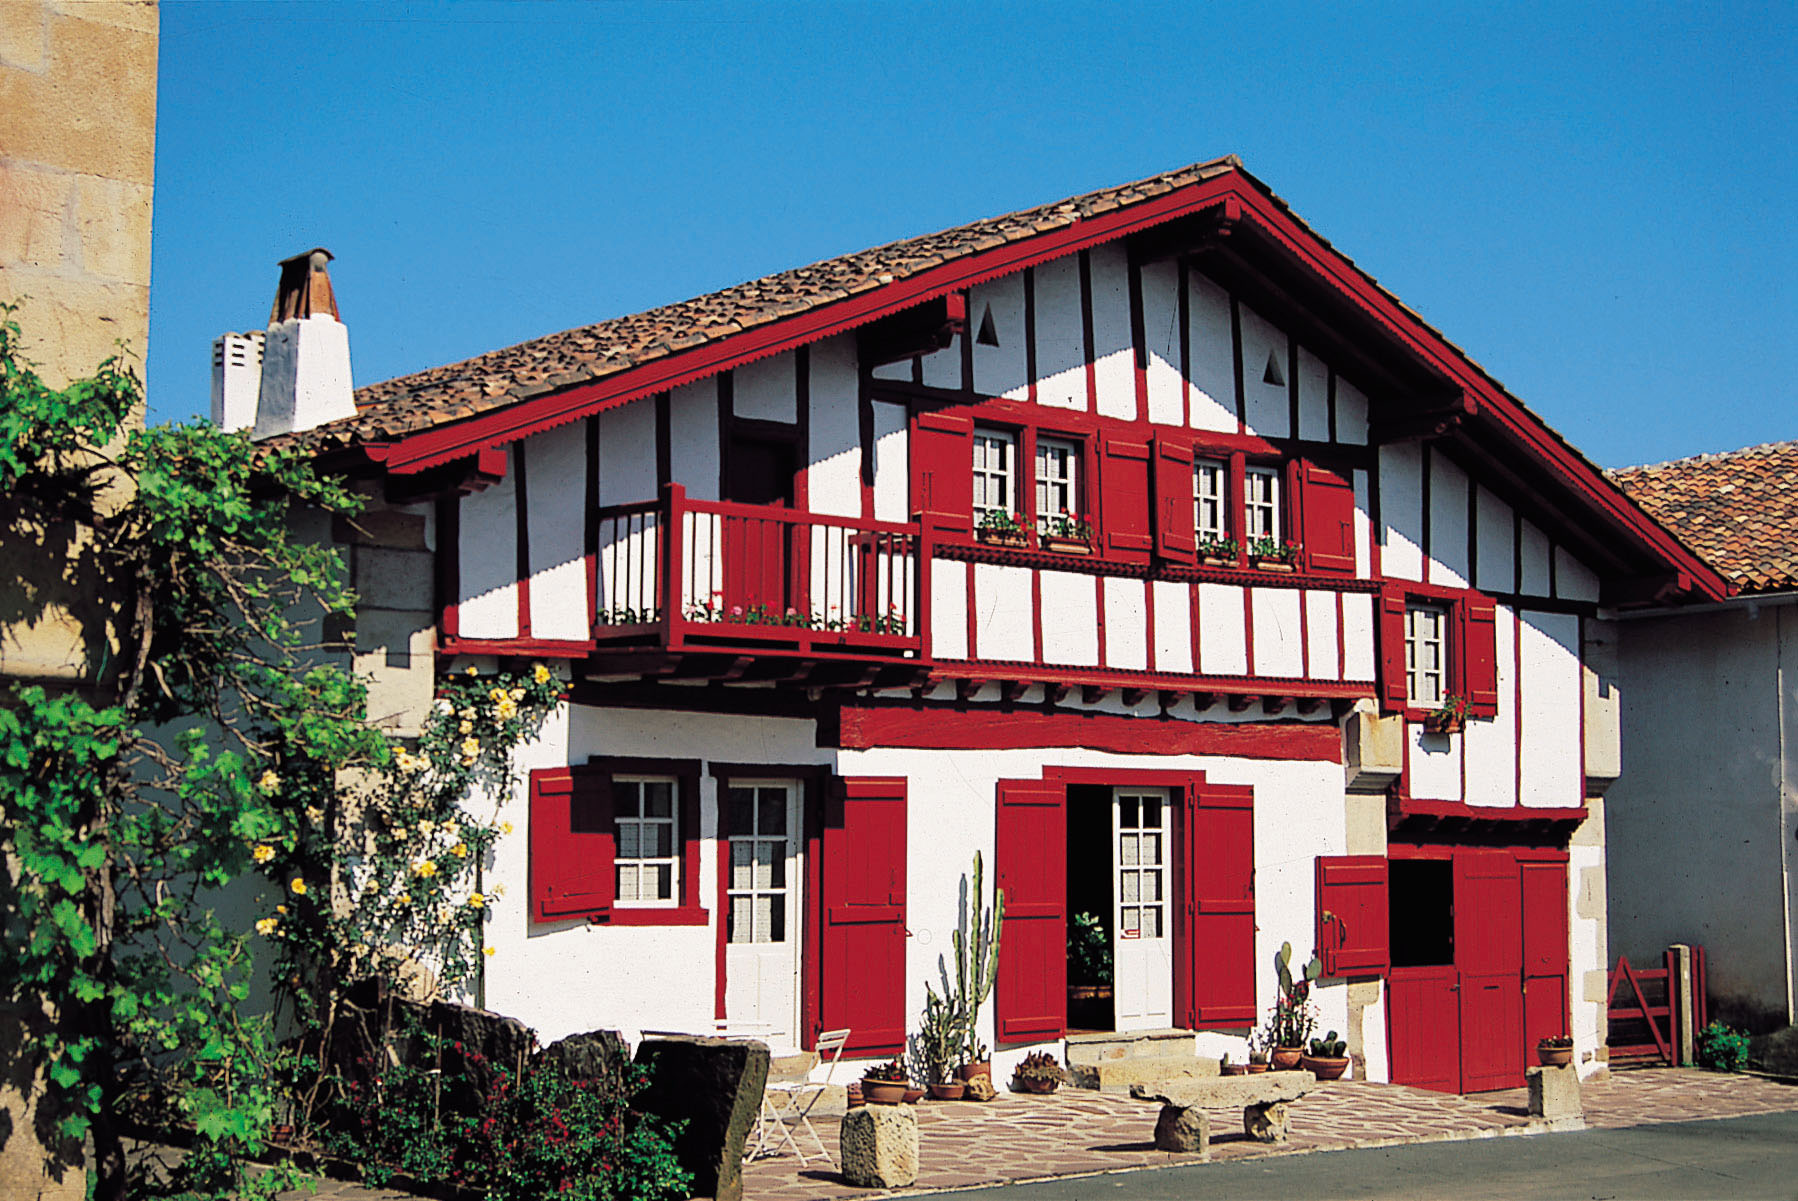 le pays basque c t terre id es week end pays basque et b arn. Black Bedroom Furniture Sets. Home Design Ideas